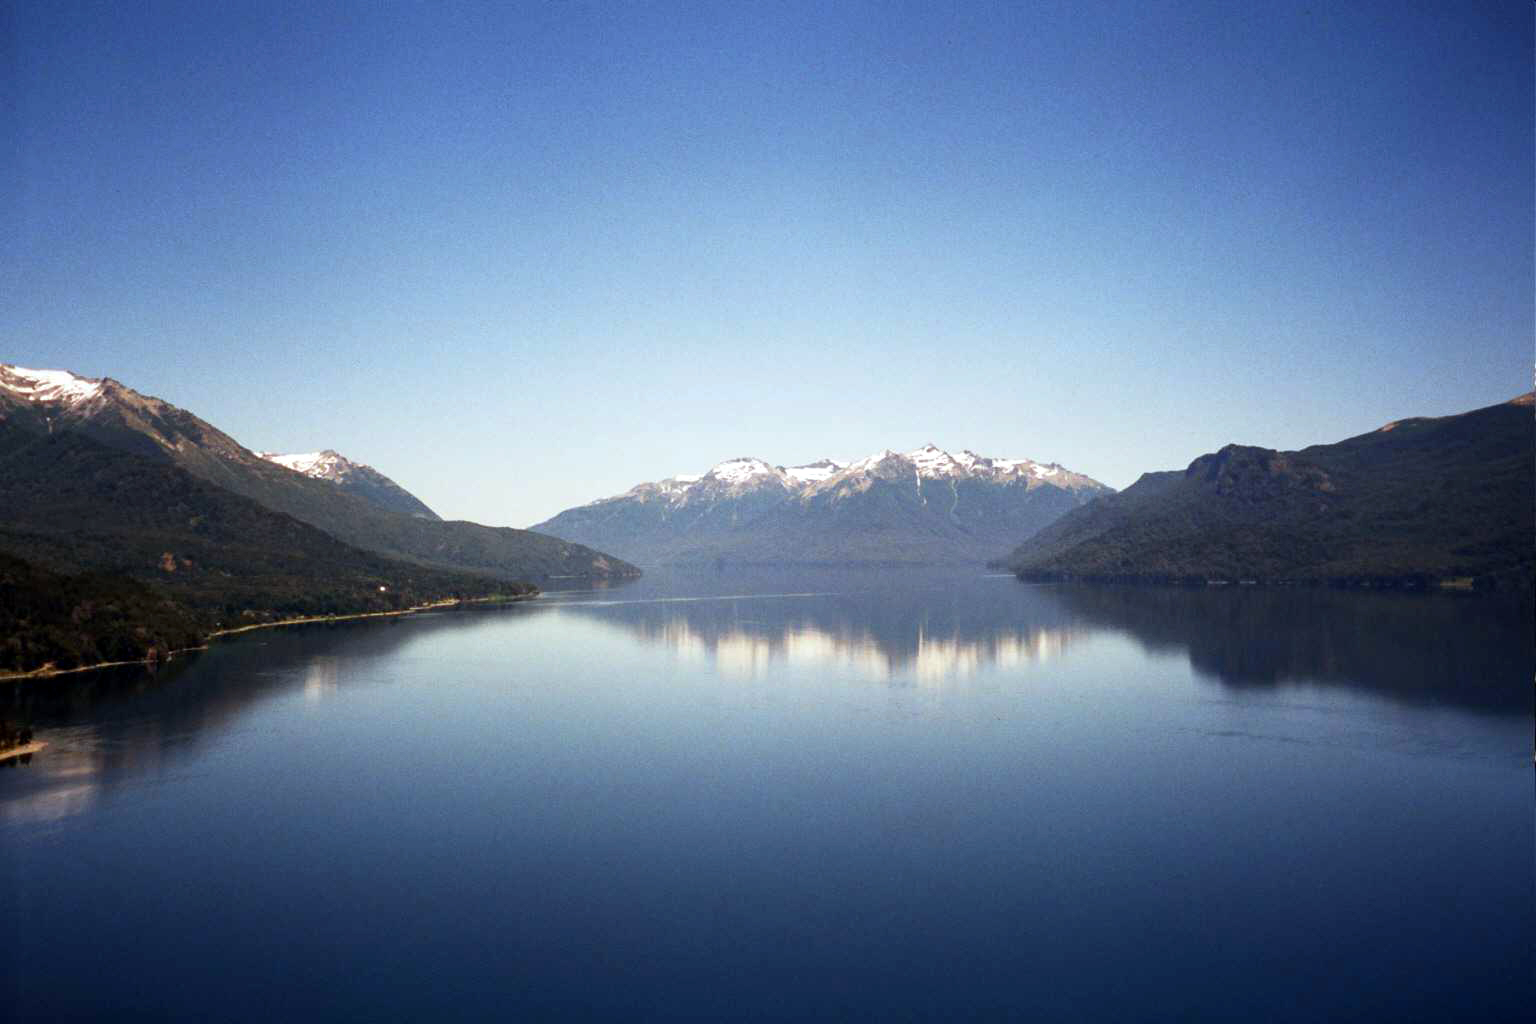 Lago Traful - Ruta de los Siete Lagos - Argentina - Wikimedia Commons - Amuitz